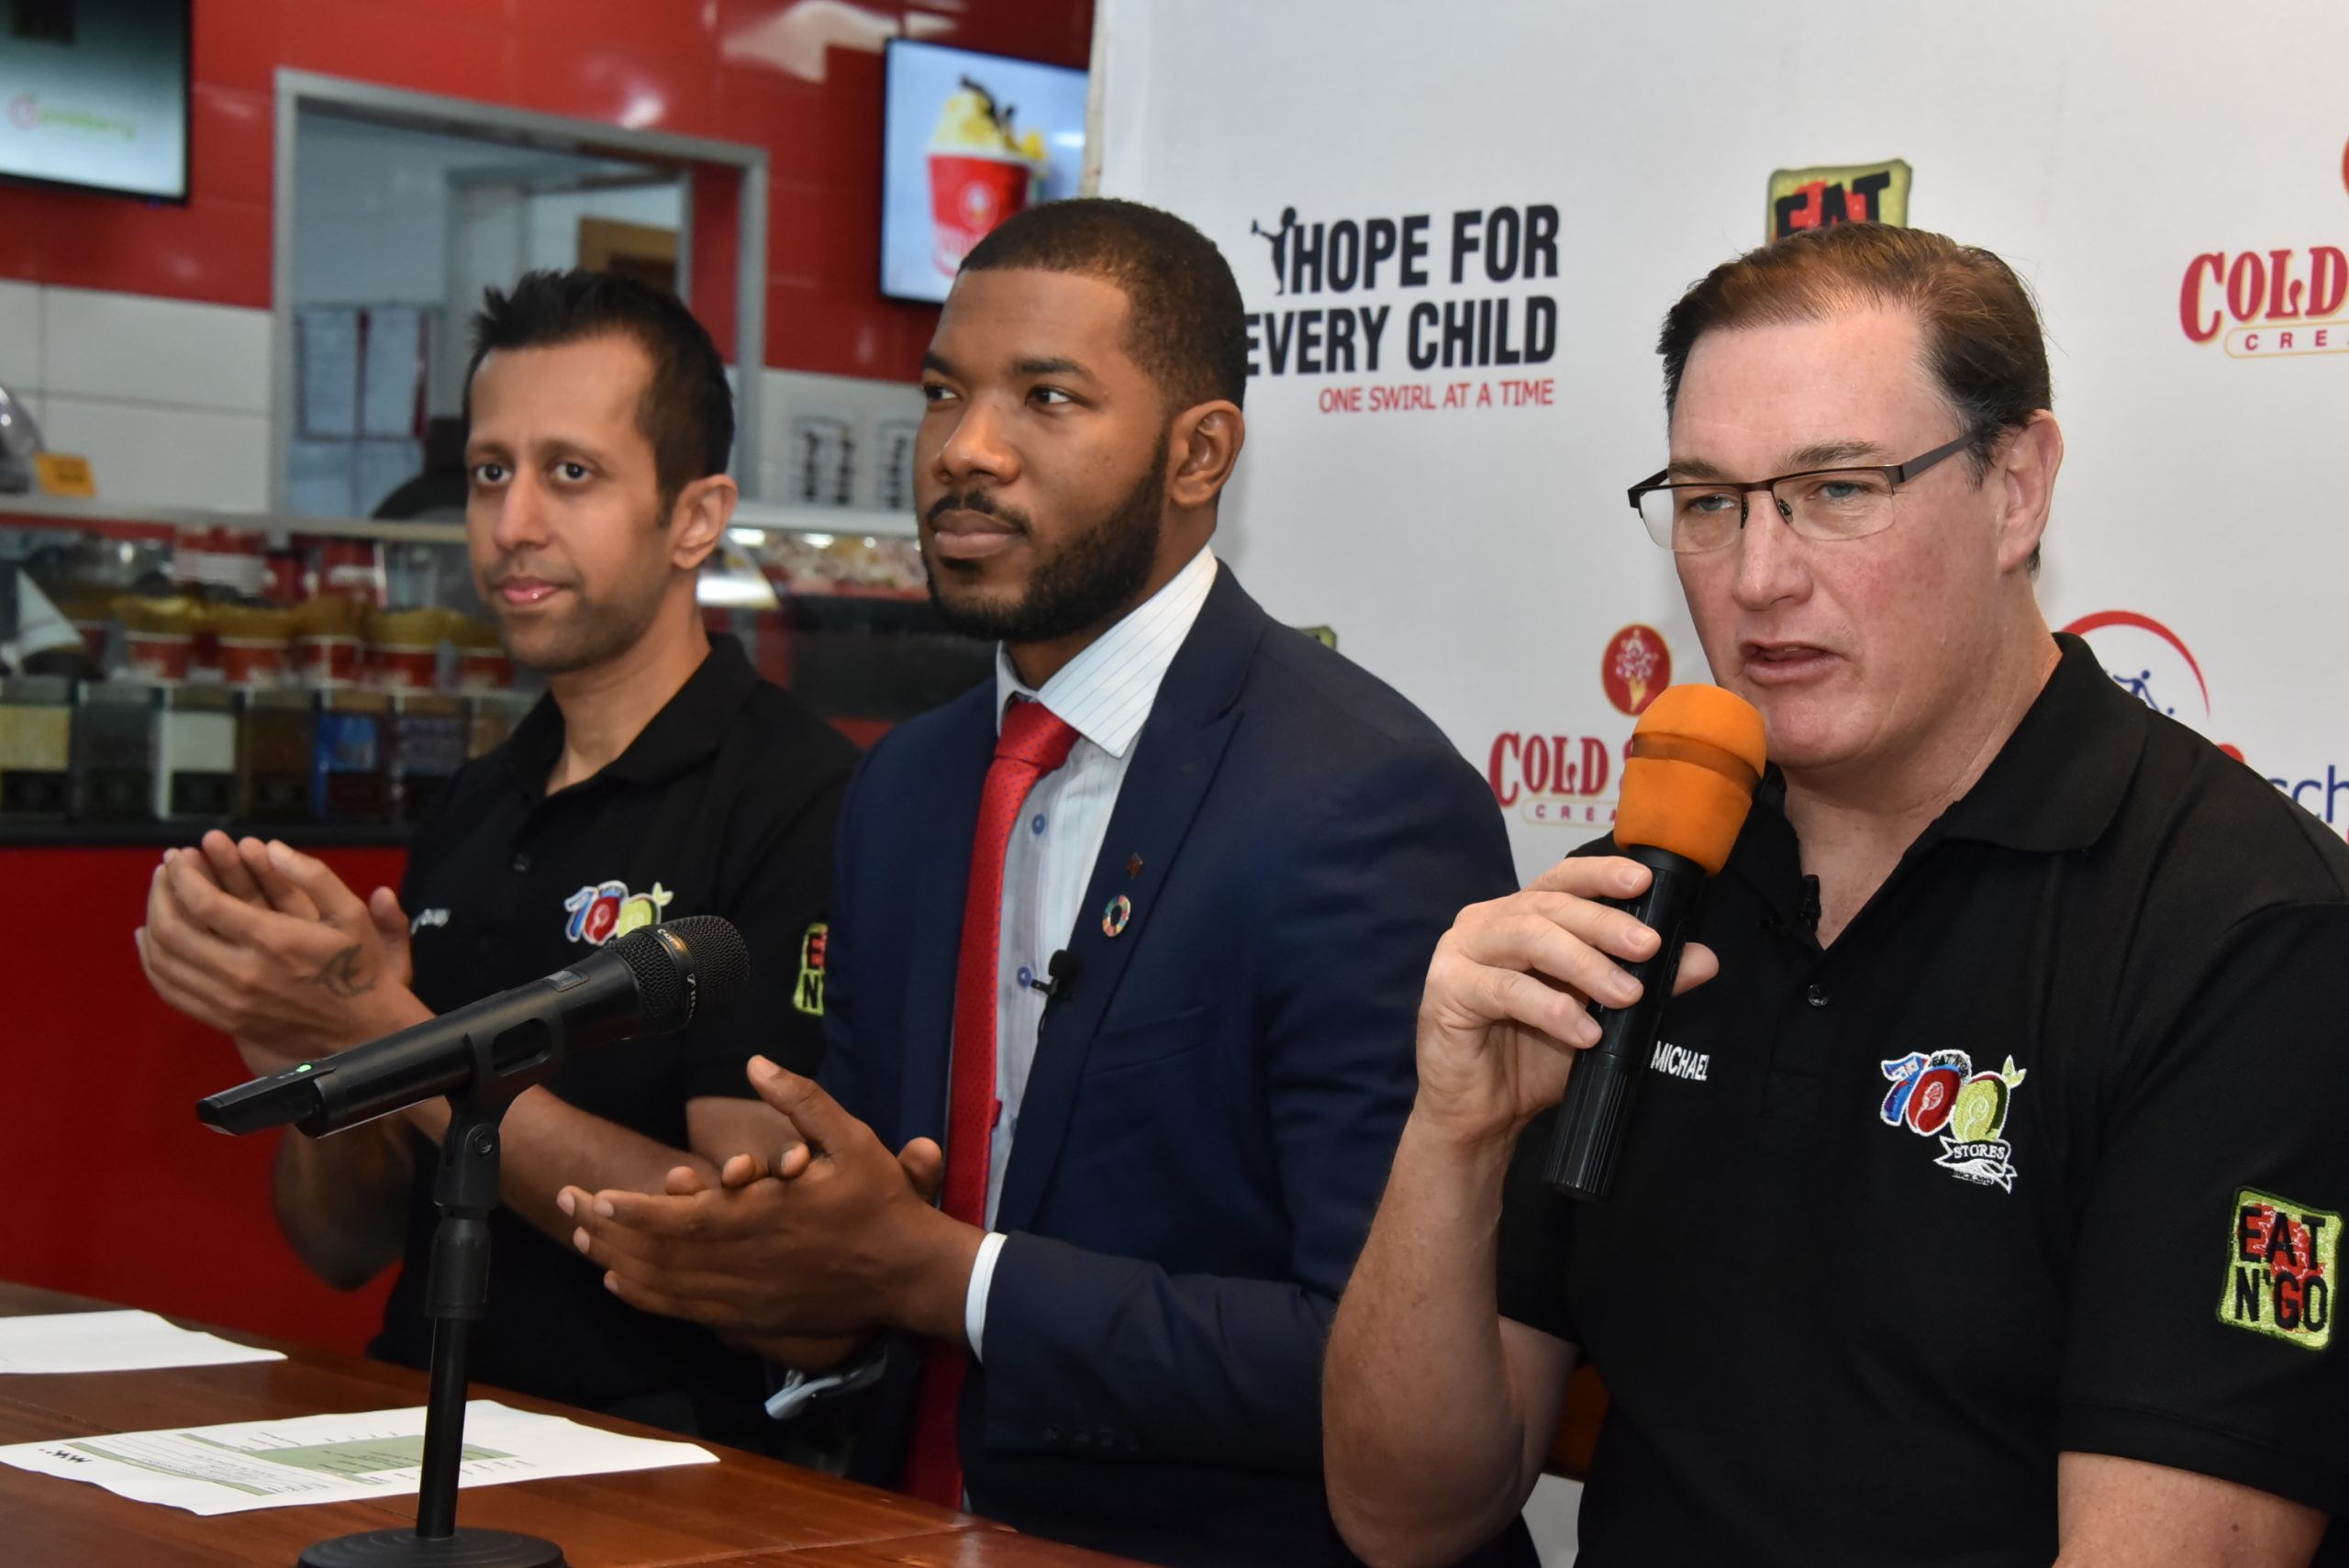 Eat'n'go Celebrates United Nations World Children's Day With 50 Million Naira Commitment To Slum2school